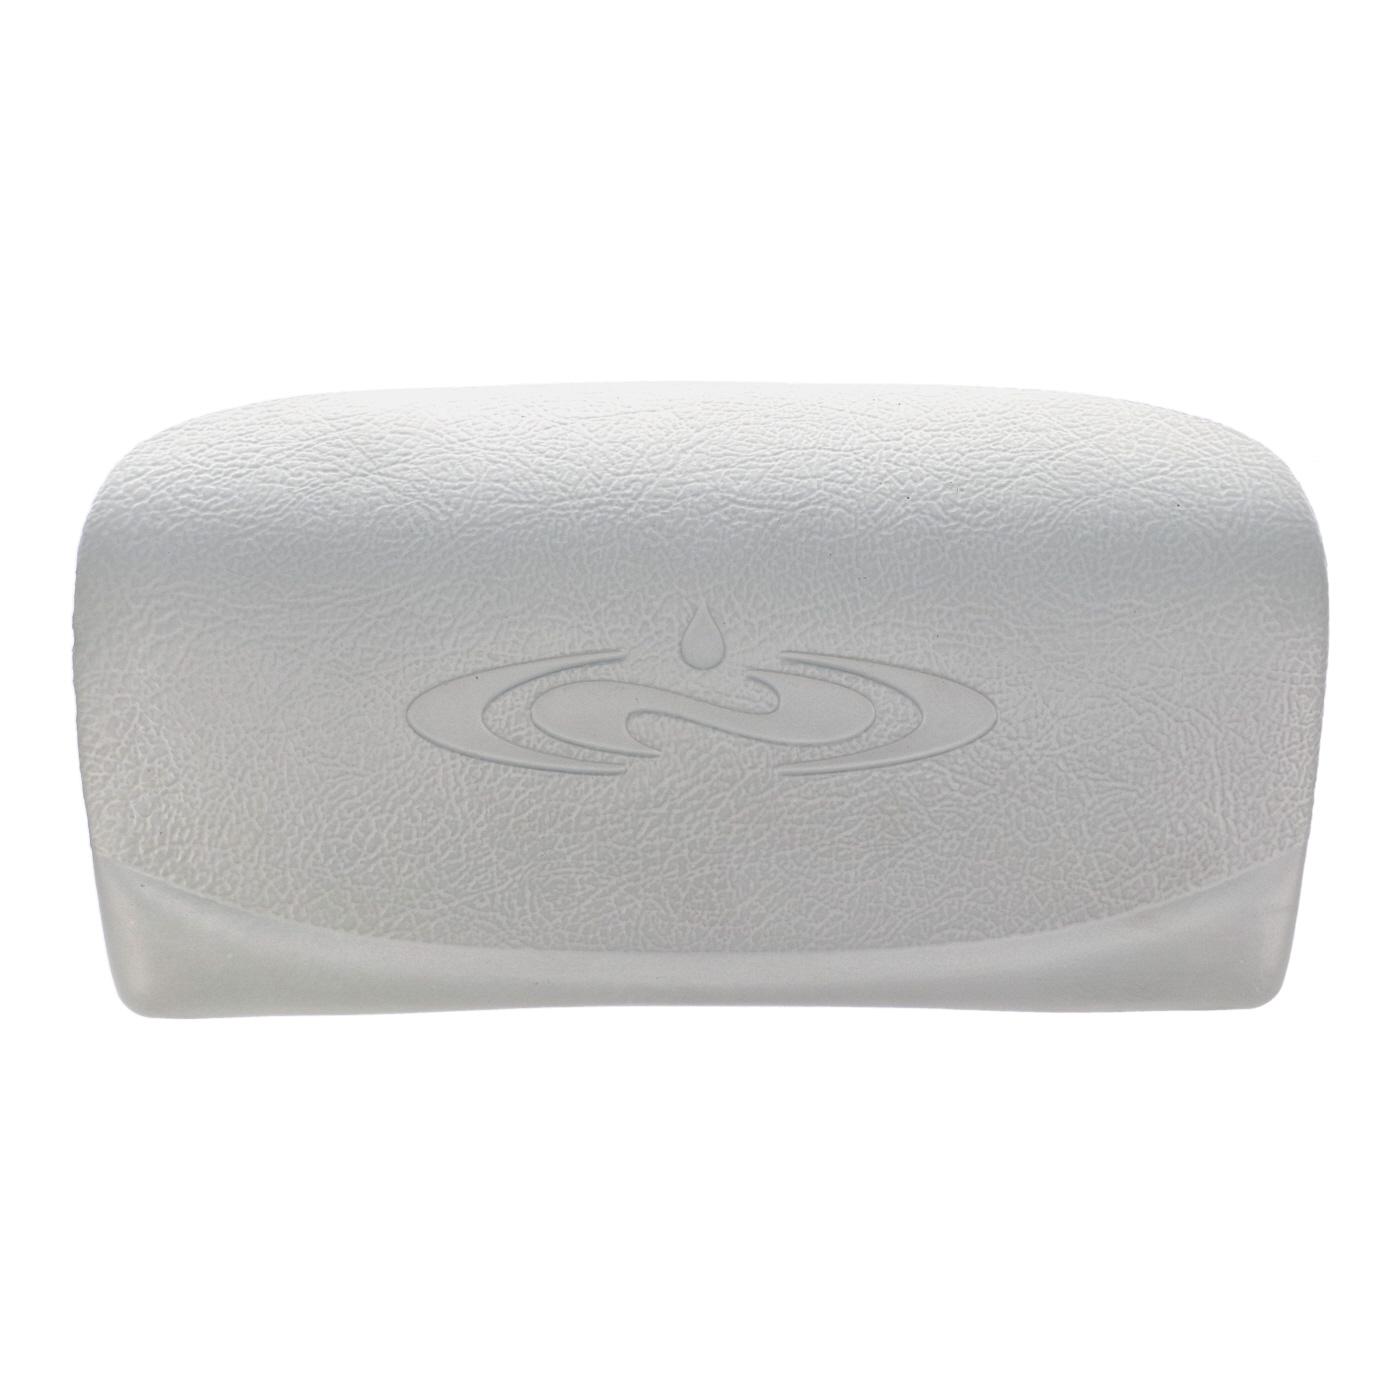 Dimension One® Spa tile Pillow